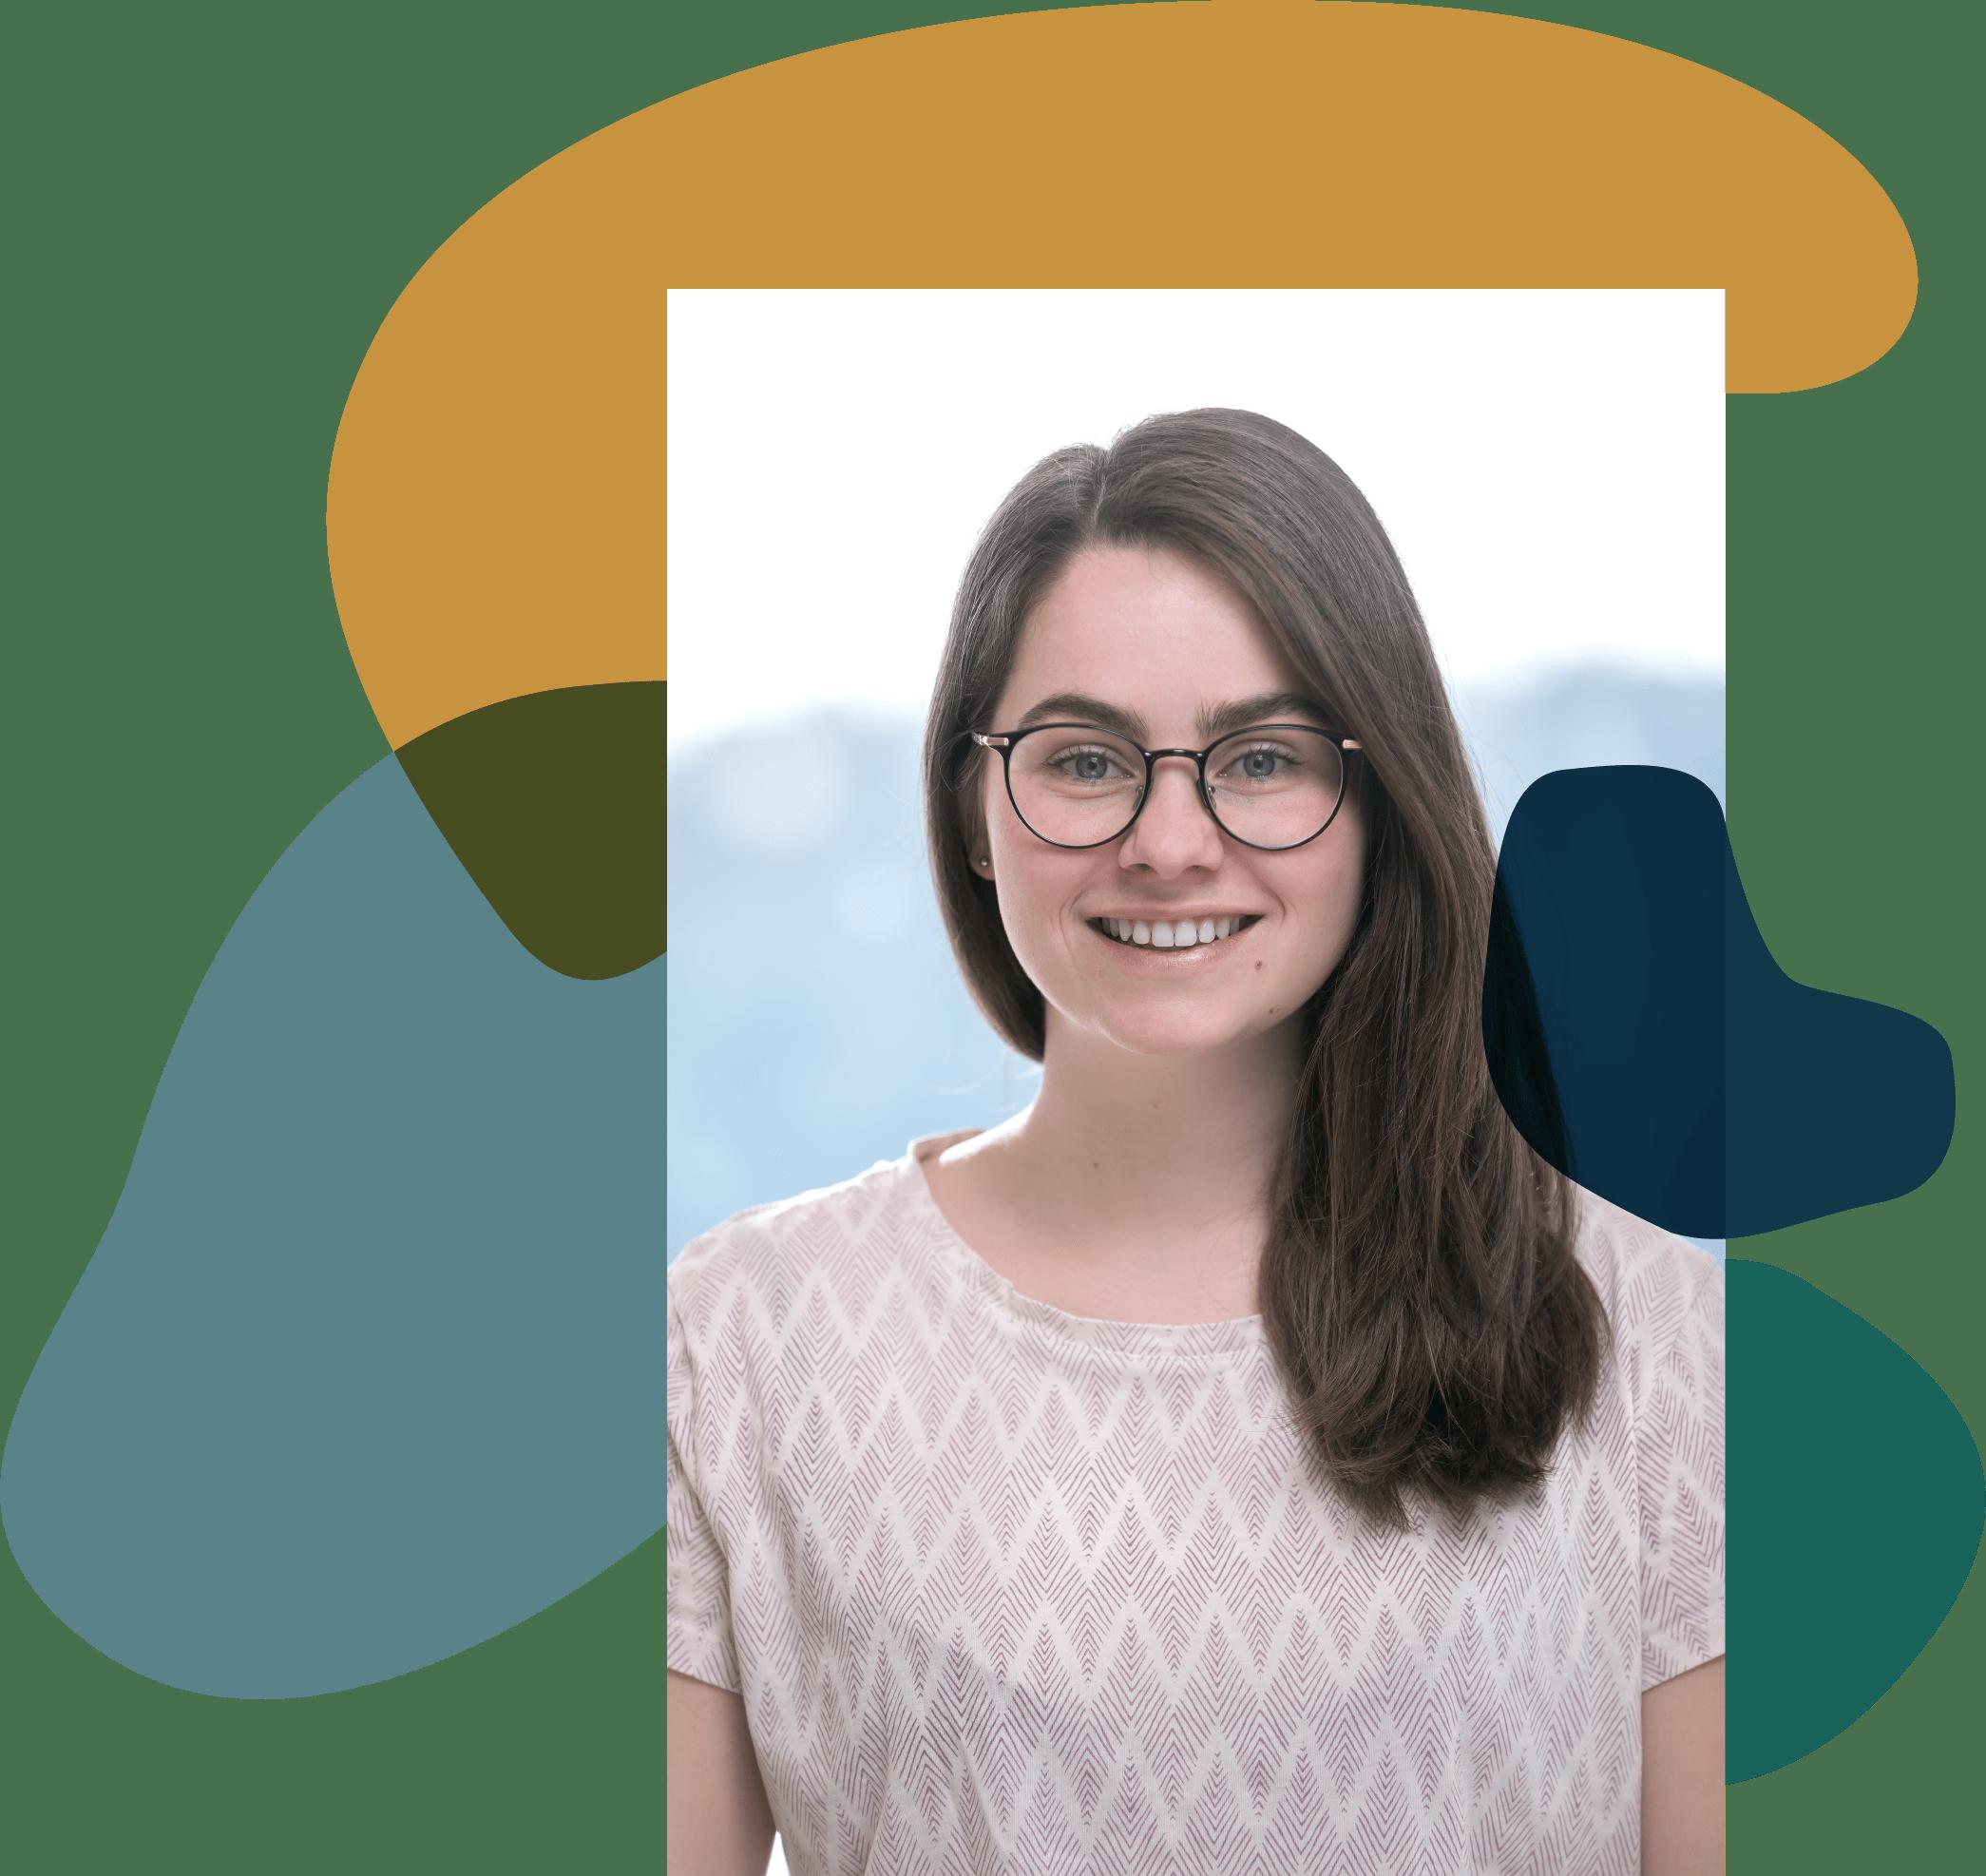 Physiotherapeutin und Mentaltrainerin Marie-Theres Tändl